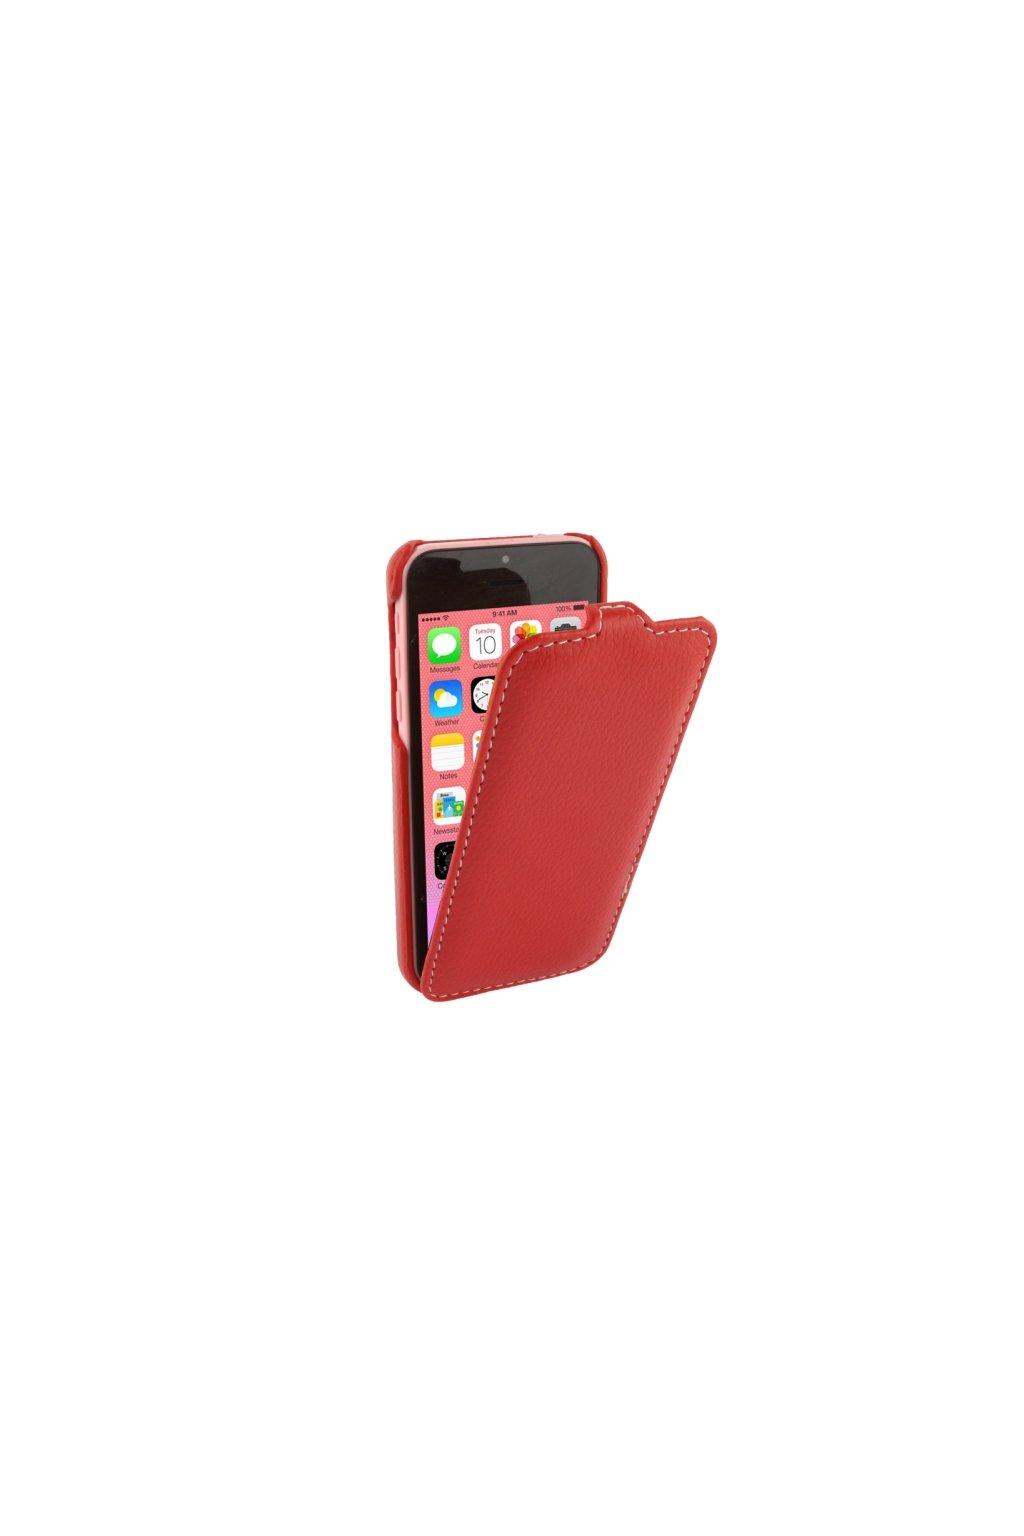 Pouzdro flip Melkco iPhone 5C, red/červená